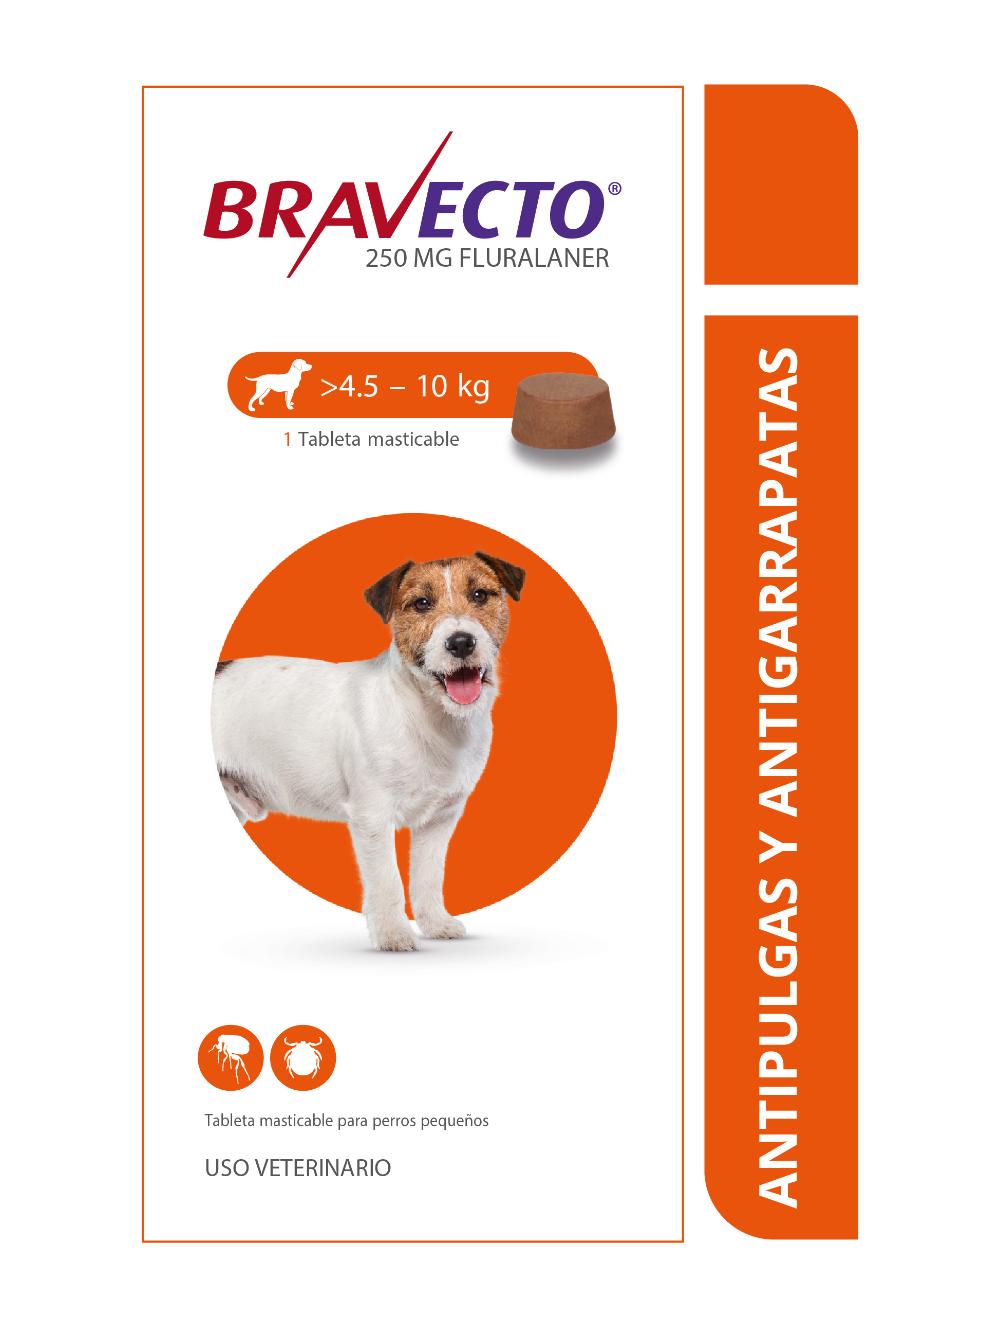 Combo Bravecto Perros de 4 a 10 Kg x 3 unidades - Ciudaddemascotas.com